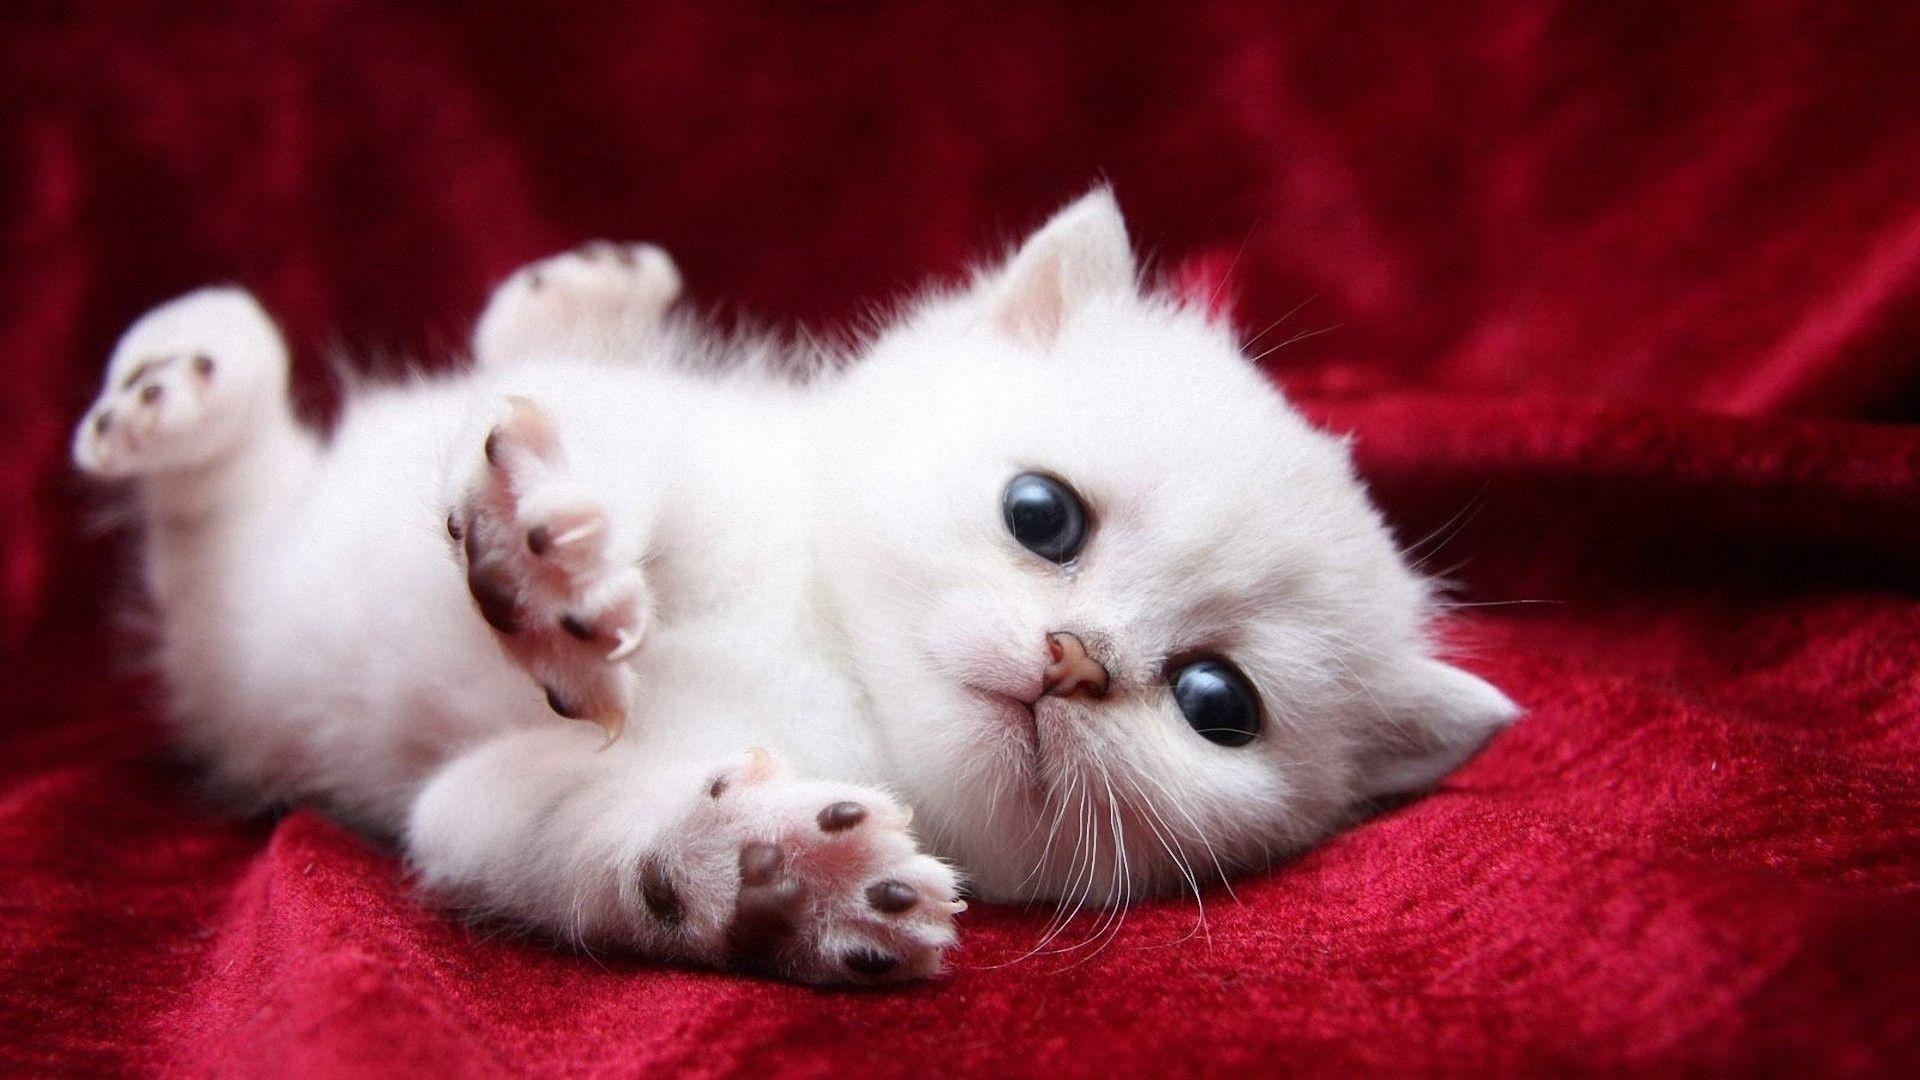 Wallpapers For > Baby Kitten Wallpaper